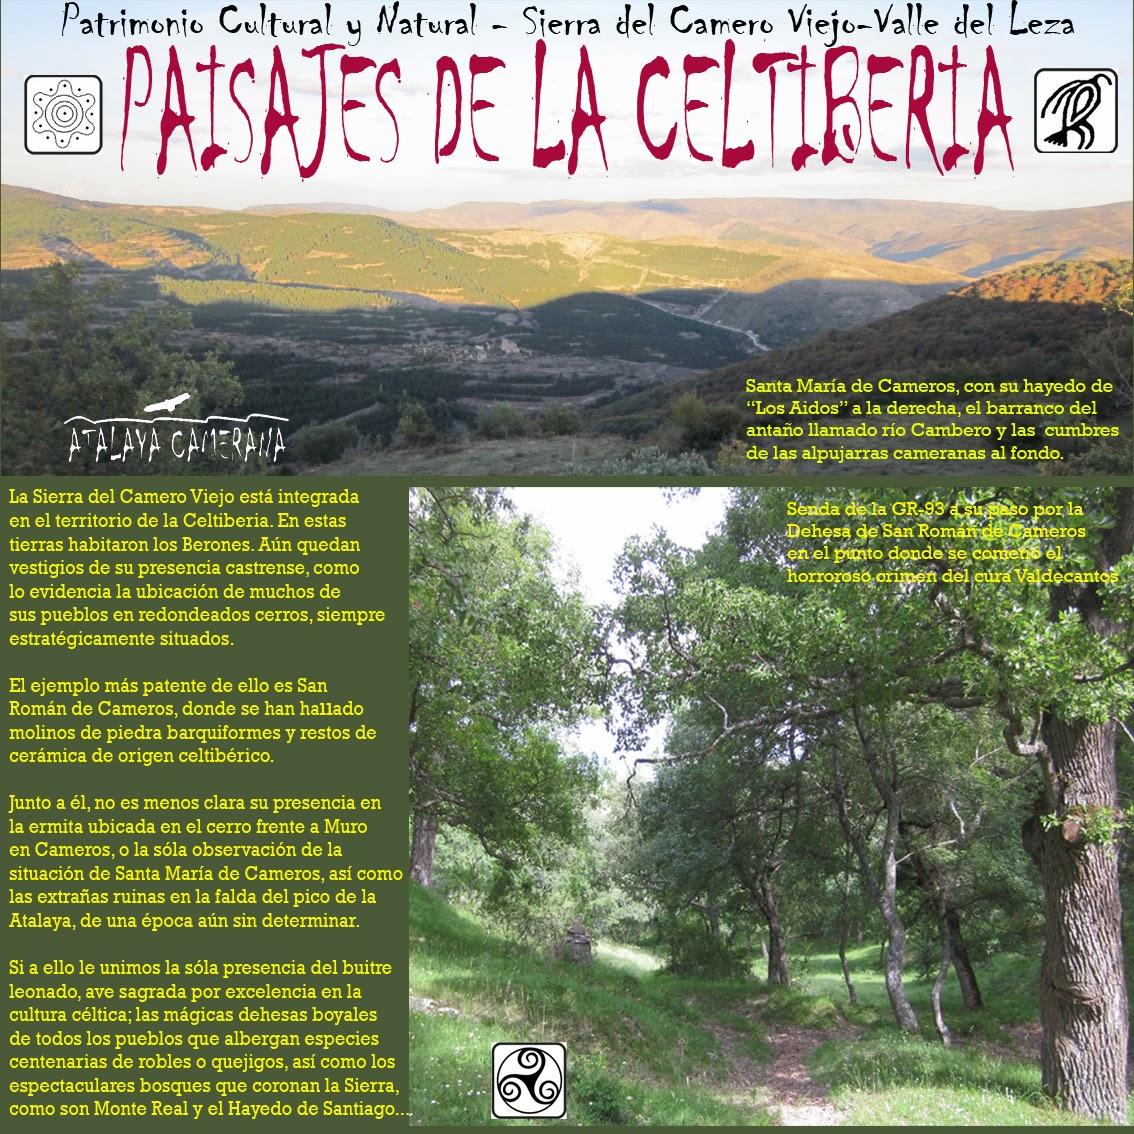 Sierra del Camero Viejo - Valle del Leza. Patrimonio Cultural y Natural. Paisajes de la Celtiberia.